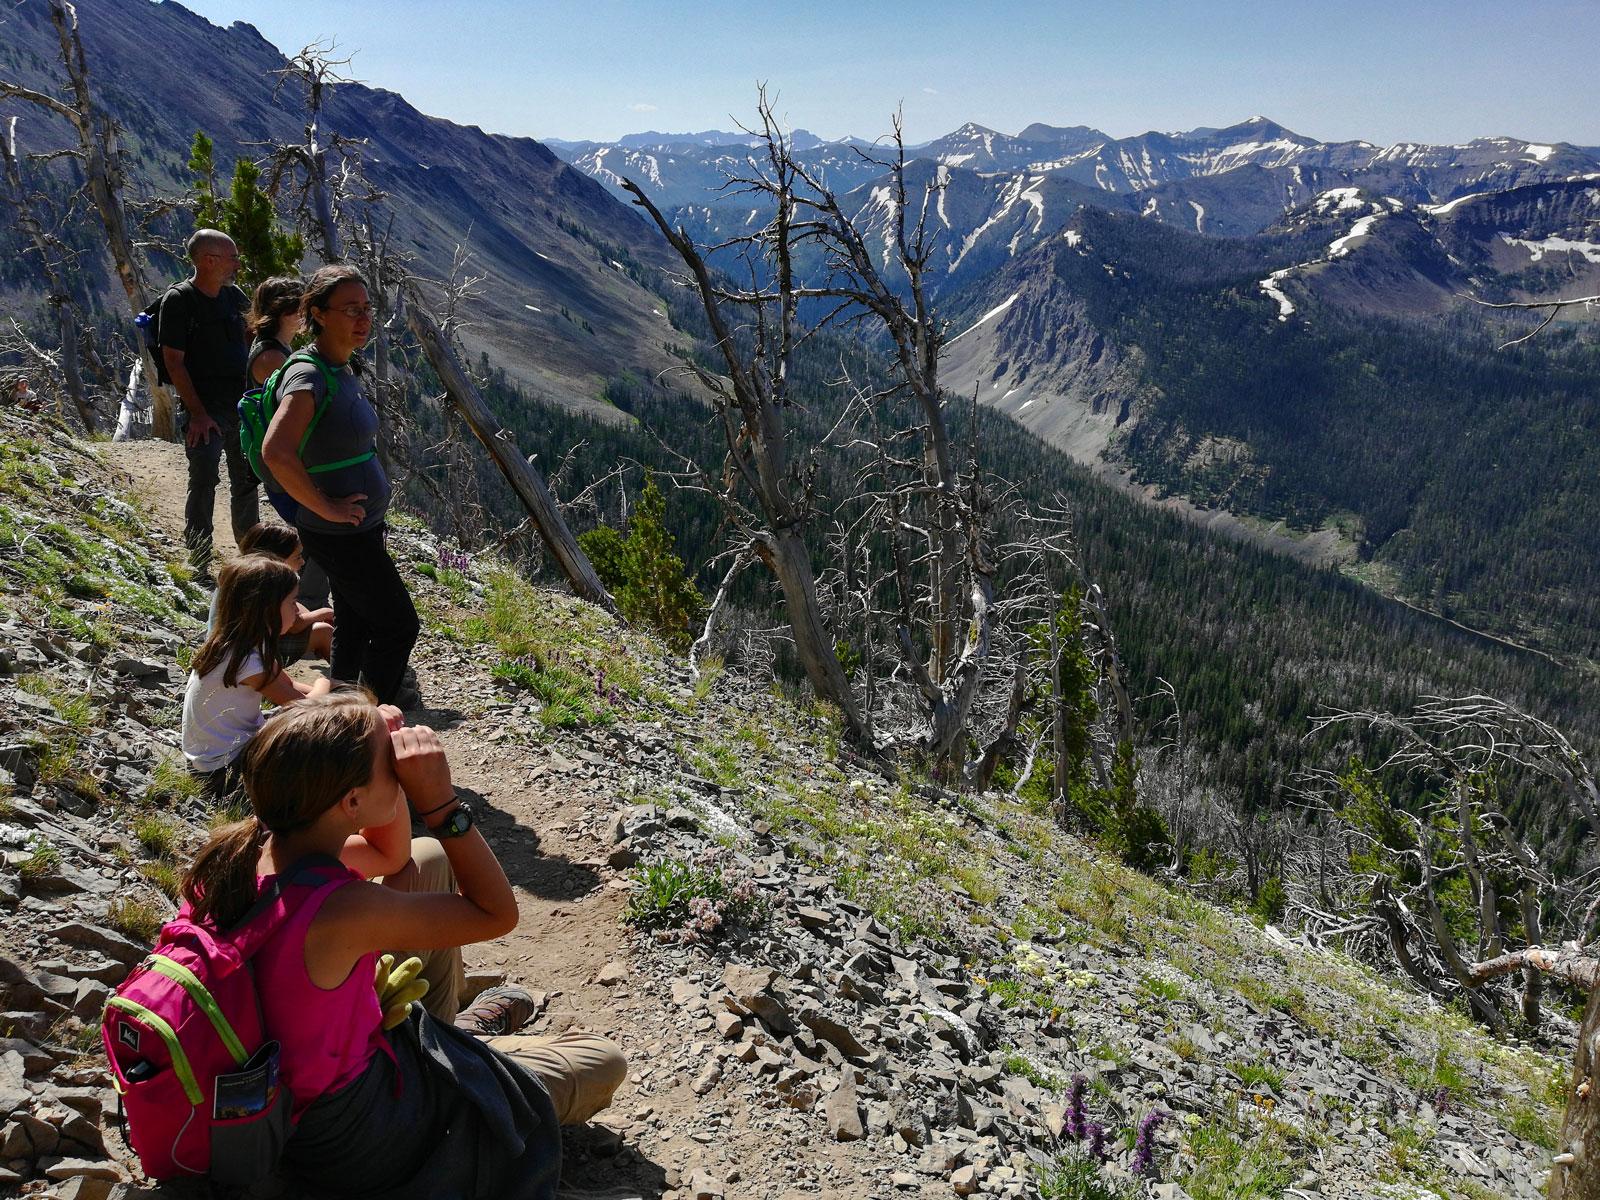 Family overlooking the Absaroka Range on the trail to Avalanche Peak